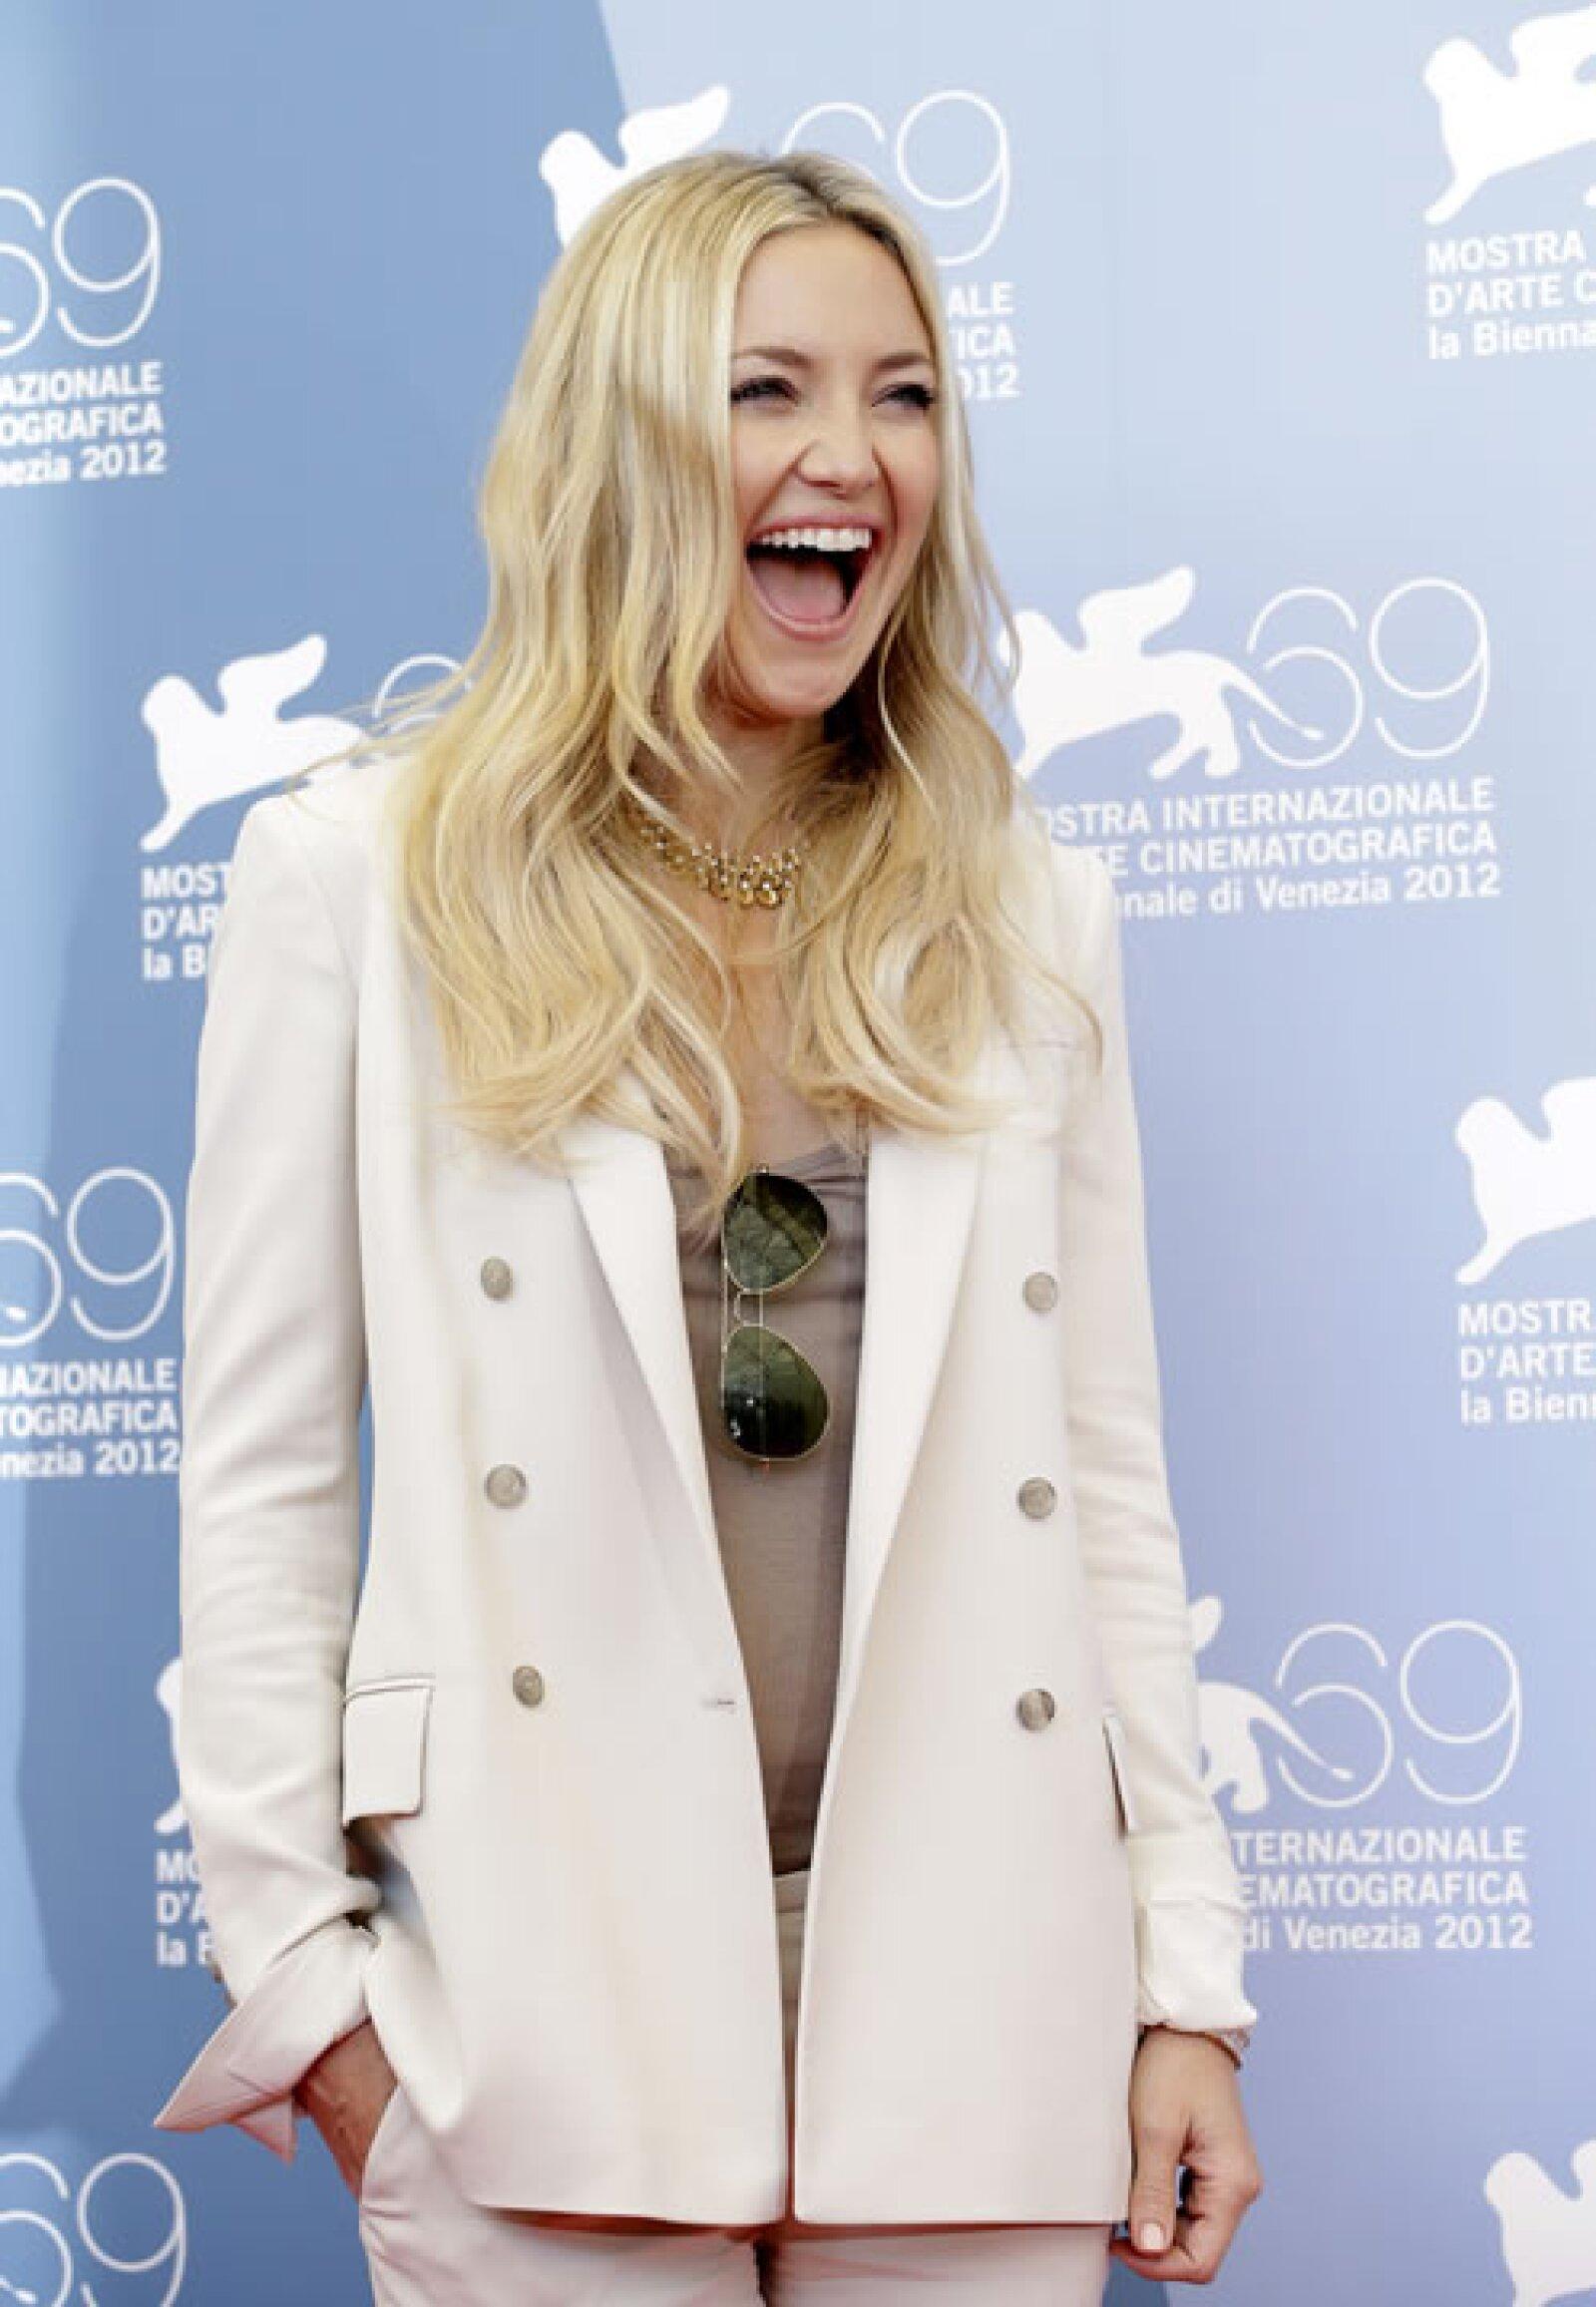 Kate Hudson se divirtió durante una llamada fotográfica.